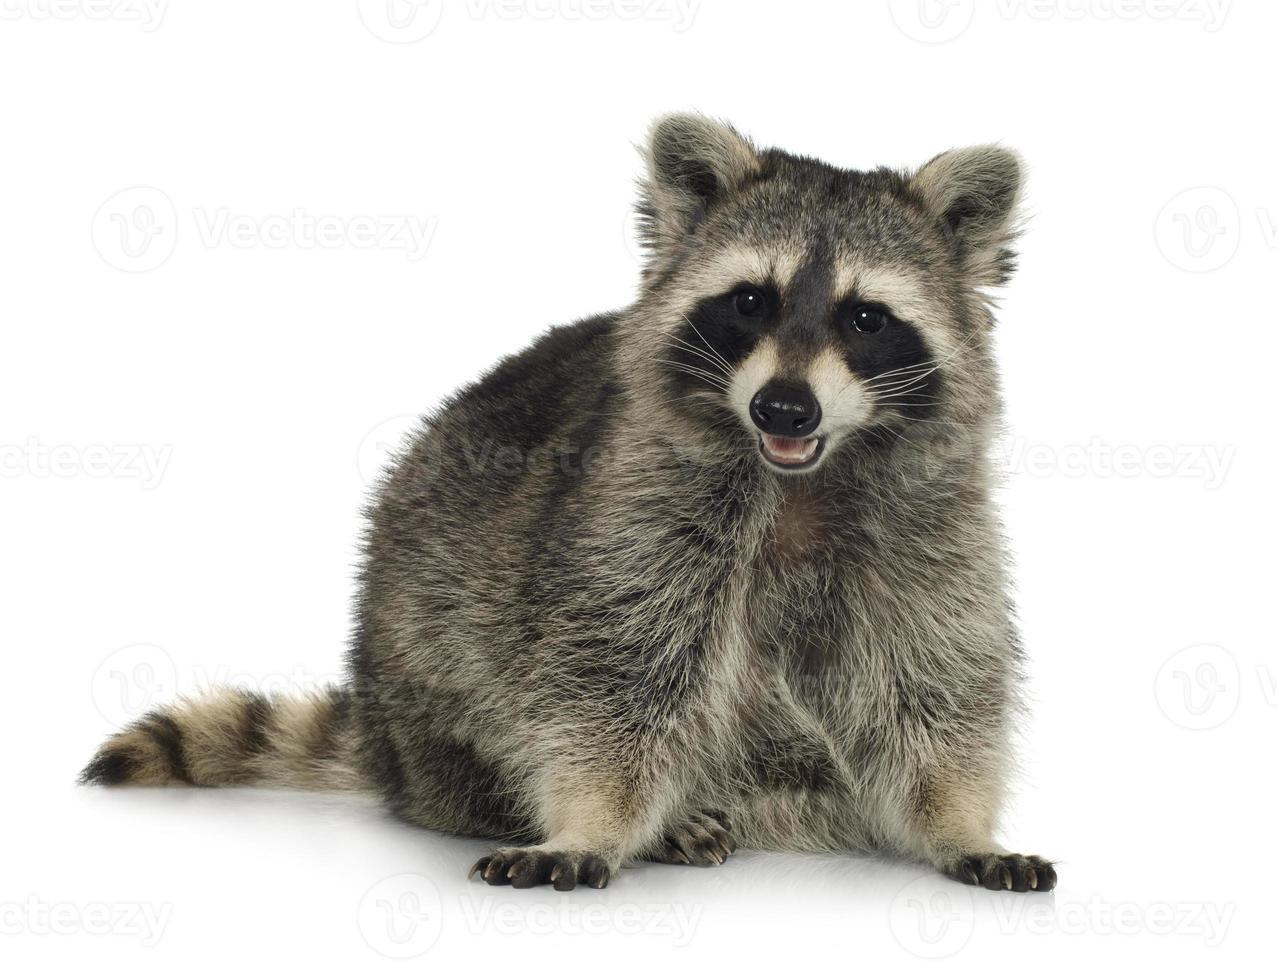 raccoon (9 months) -  Procyon lotor photo